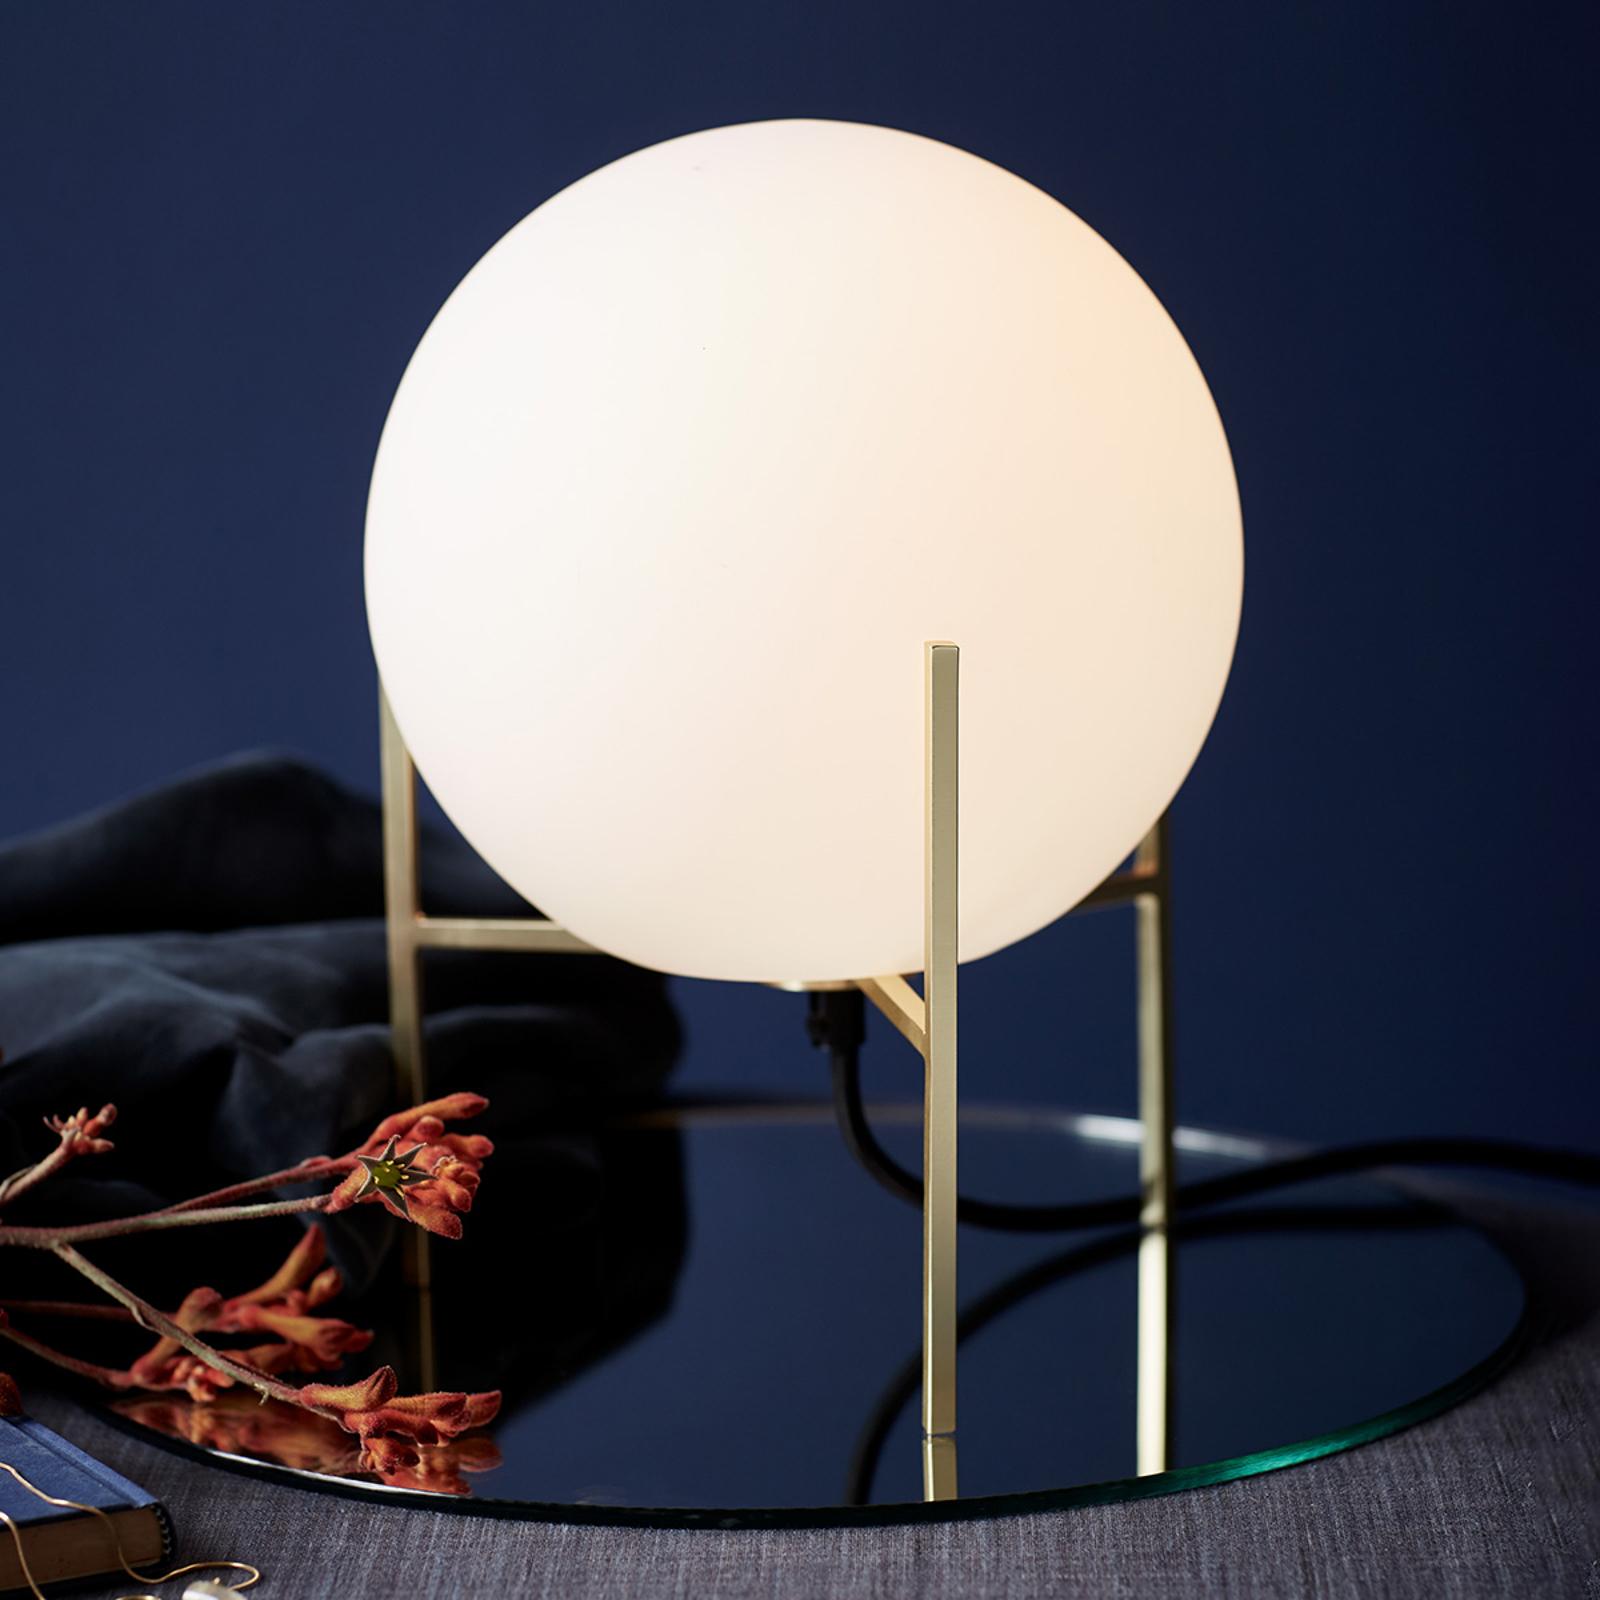 Tafellamp Alton met witte glazen kap